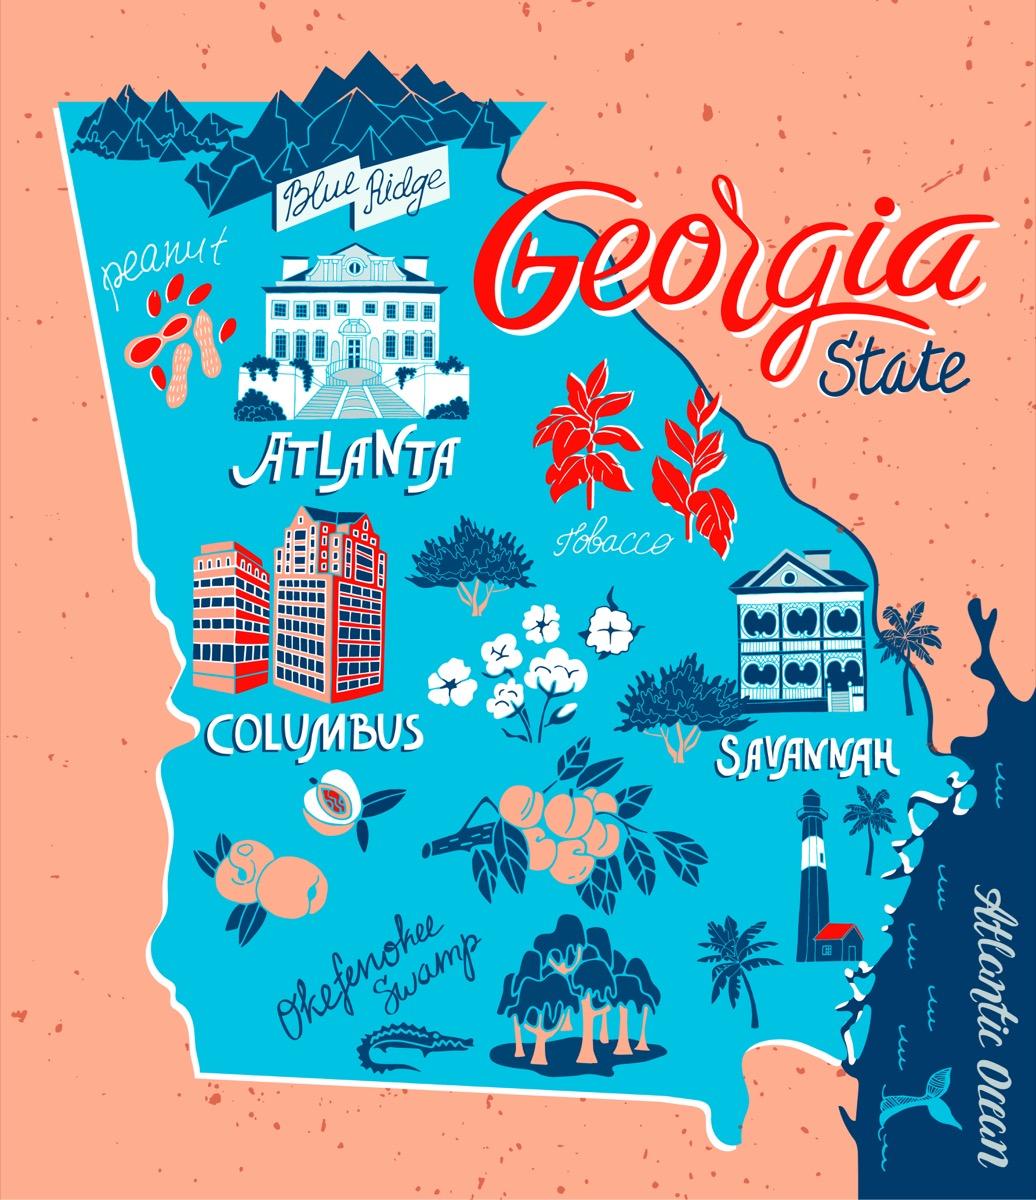 georgia U.S. state 1990s-era news stories